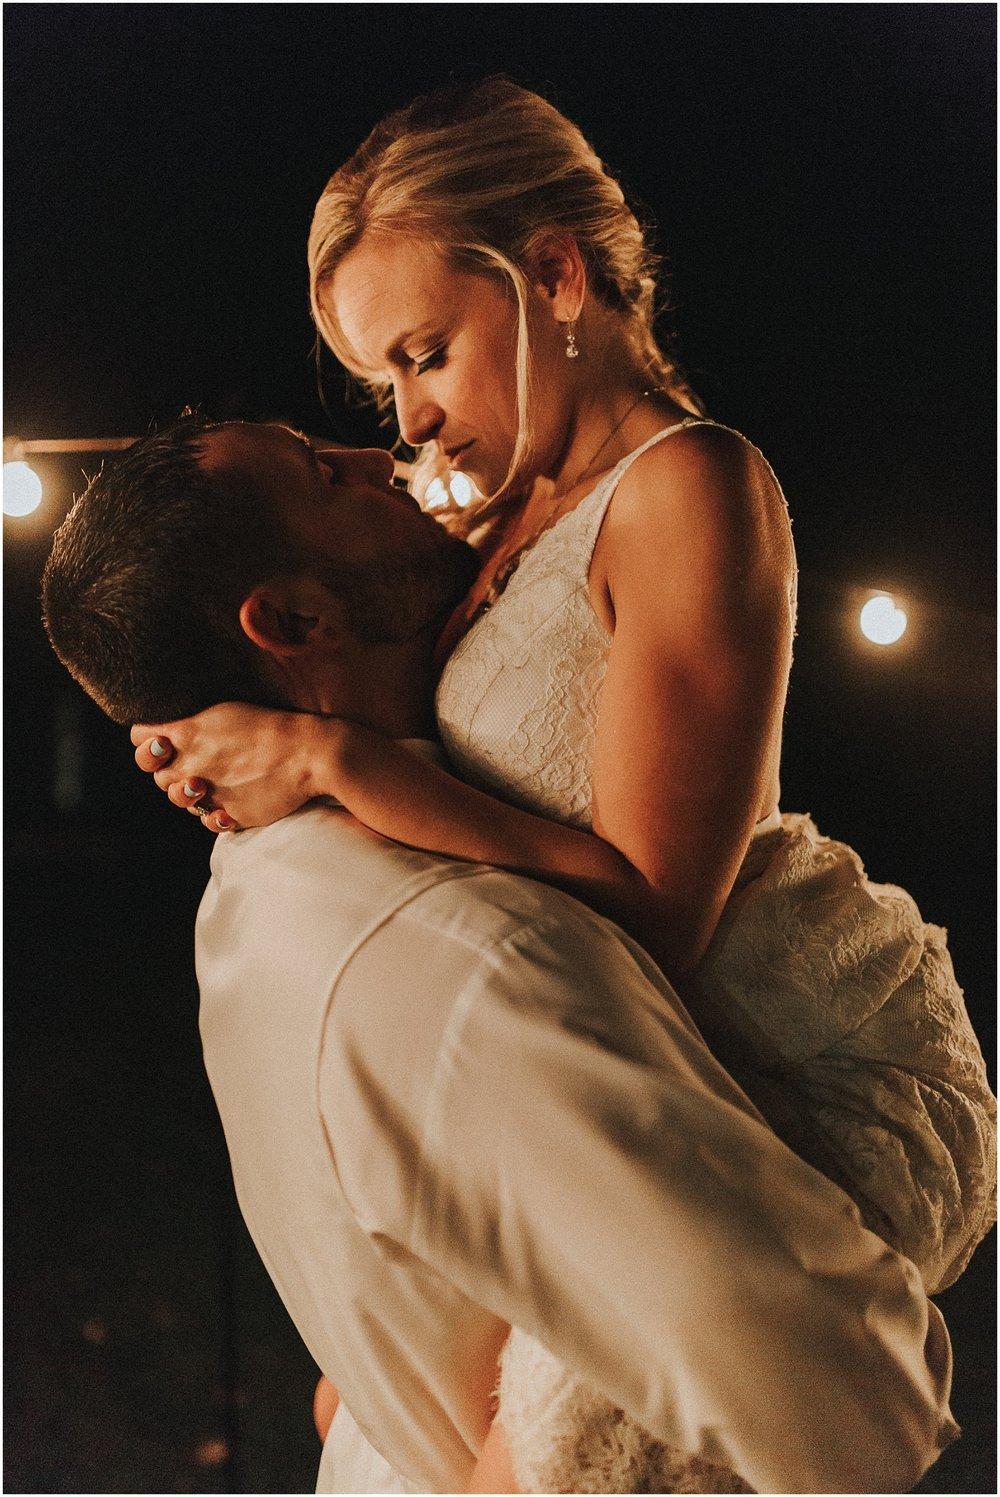 waterloo-village-waterloo village-wedding-outdoor wedding-rustic-boemian-new jersey-bride-groom-wedding party-davids bridal-wedding dress-wedding-first kiss-intimate wedding_0402.jpg